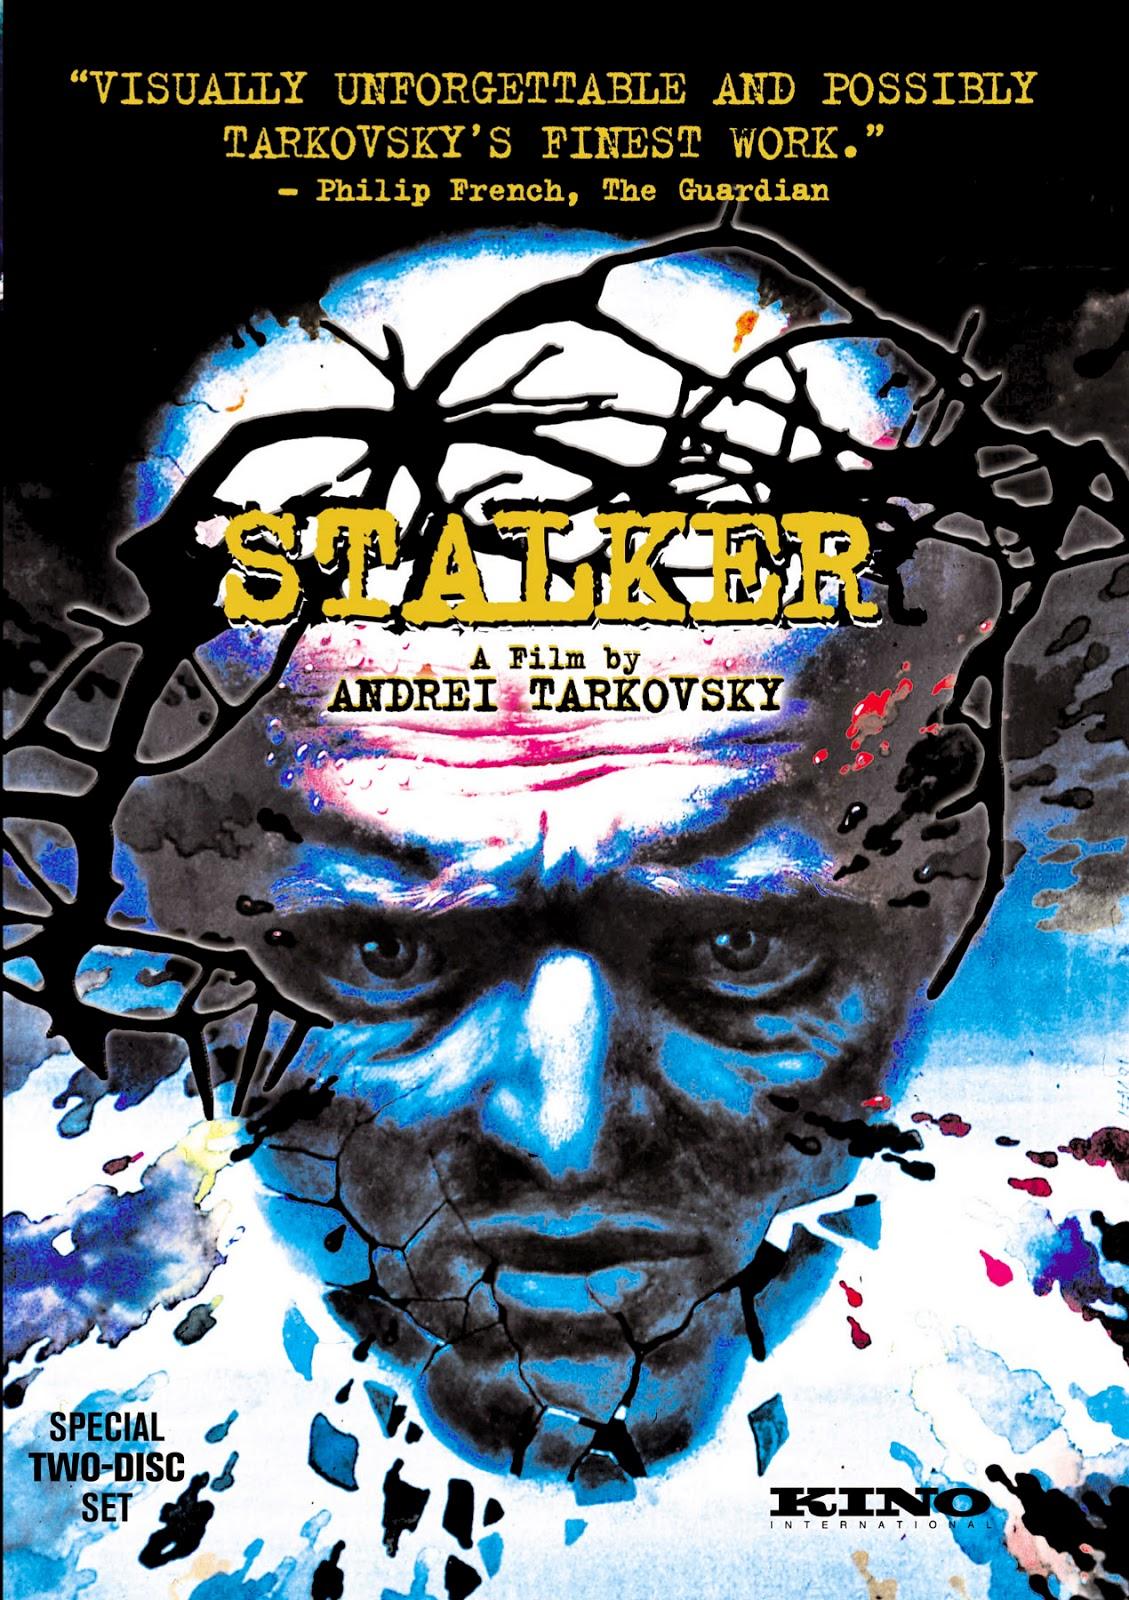 Stalker (Andrei Tarkovsky, 1979) BrRip 1080p VOSE